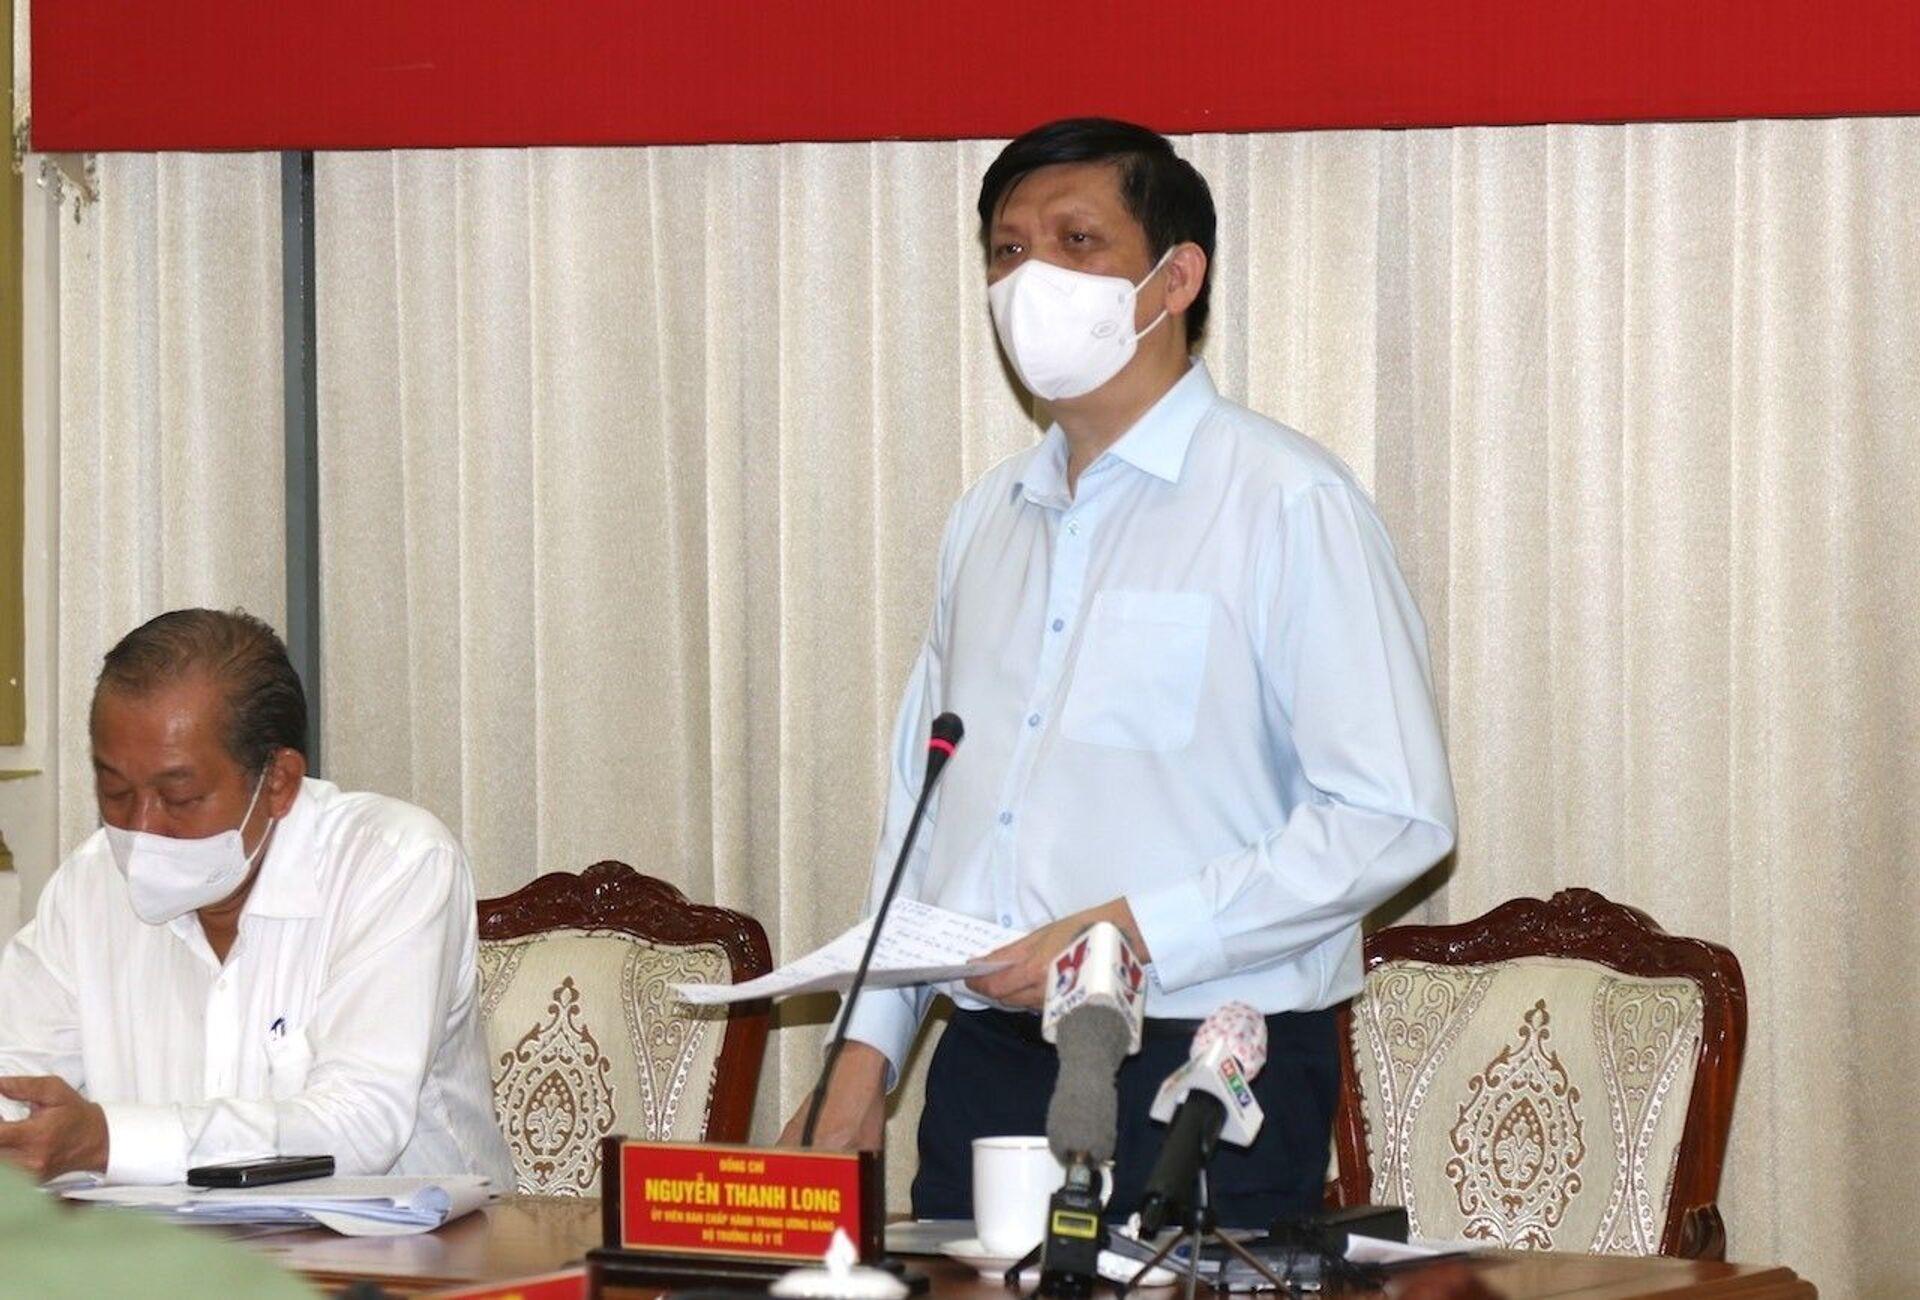 Việt Nam sẽ nhận 20 triệu liều vaccine Sputnik V của Nga - Sputnik Việt Nam, 1920, 02.06.2021